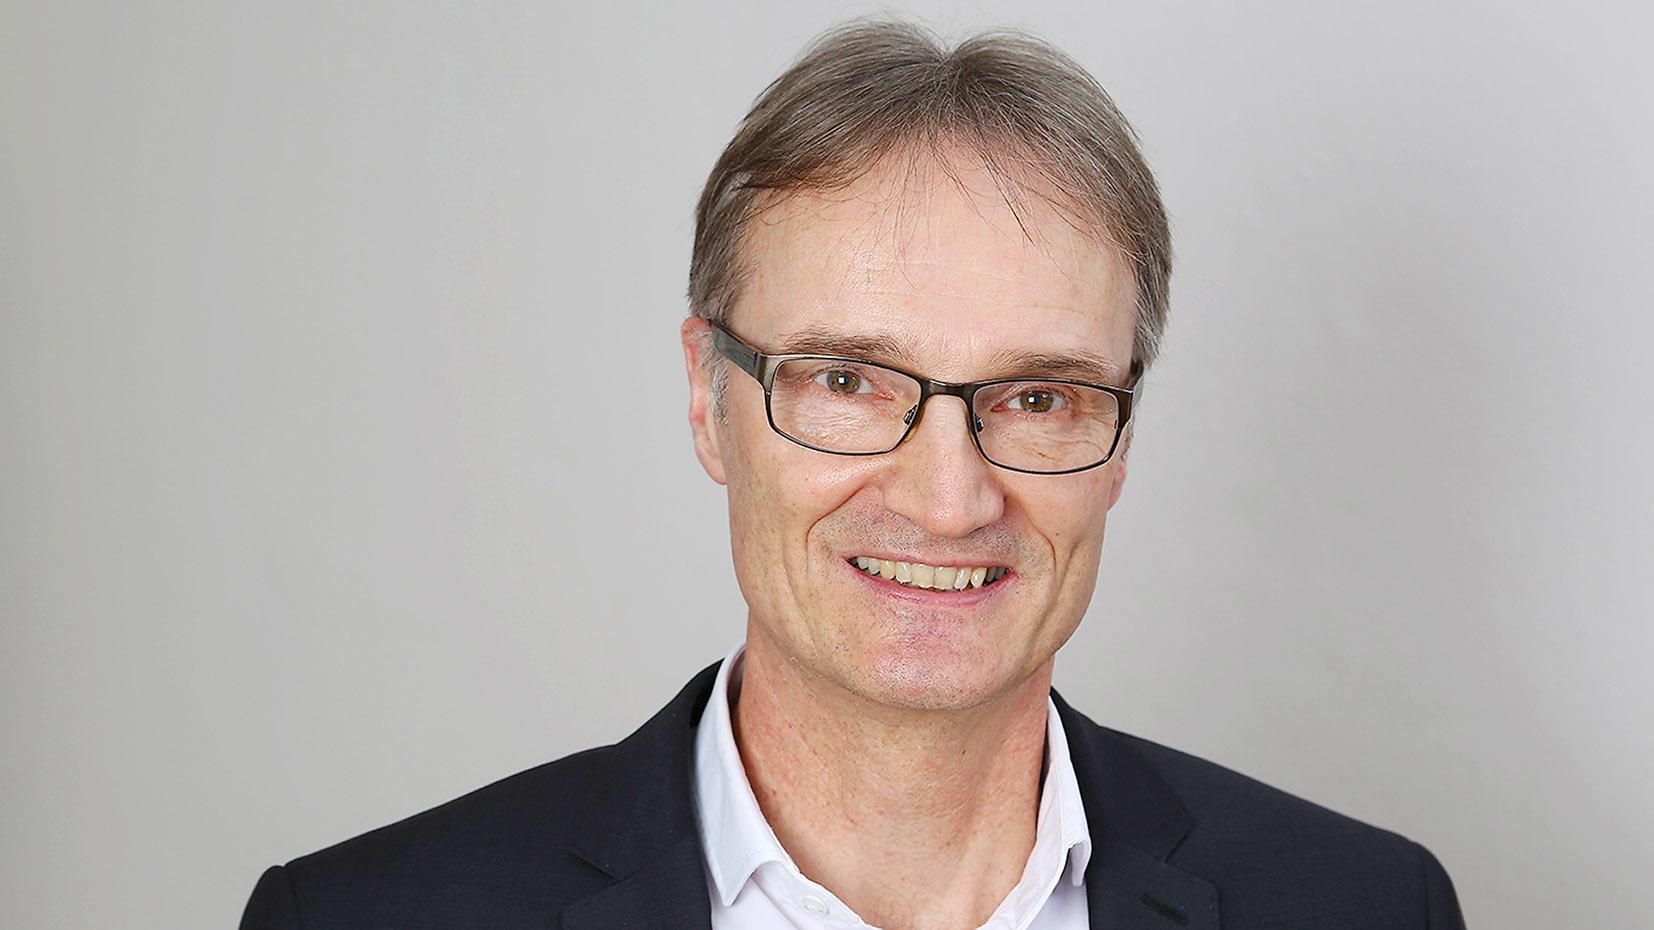 25 28 Pro Kontra markusbuholzer quer rundgang 2 2019 klett und balmer